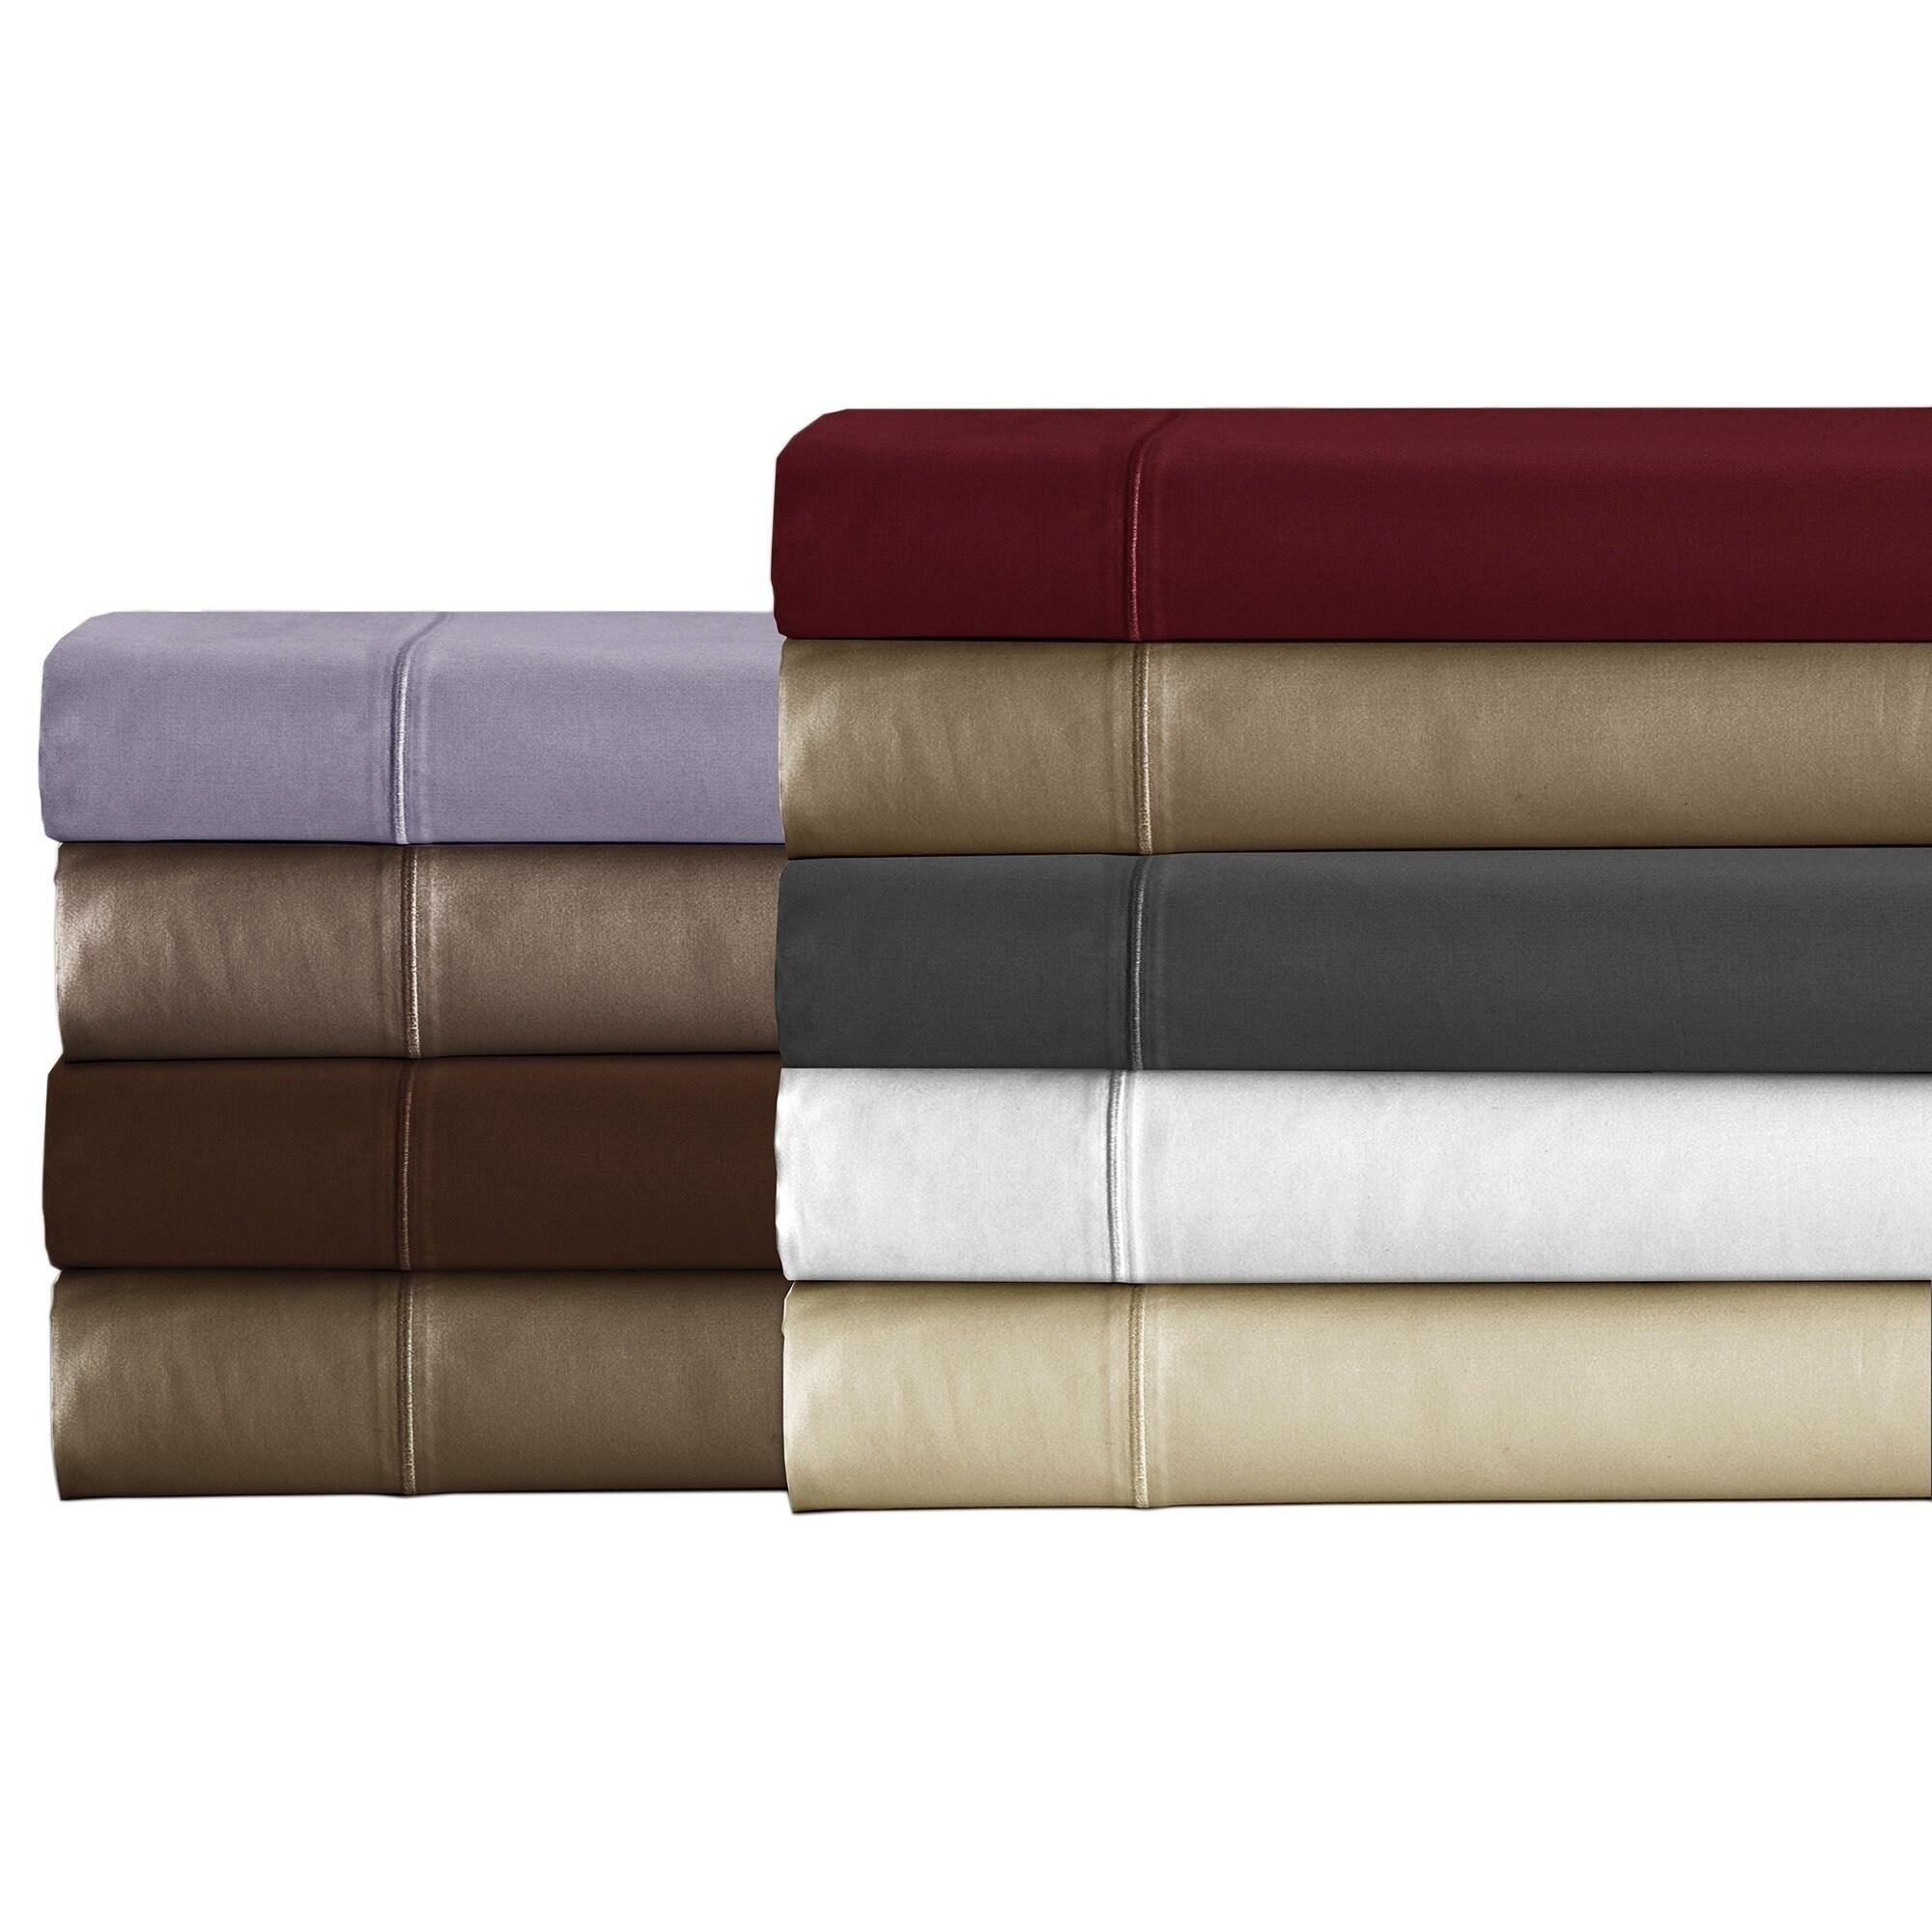 Bedding Set 1000 TC//1200 TC Egyptian Cotton Select Item UK Size Grey Solid